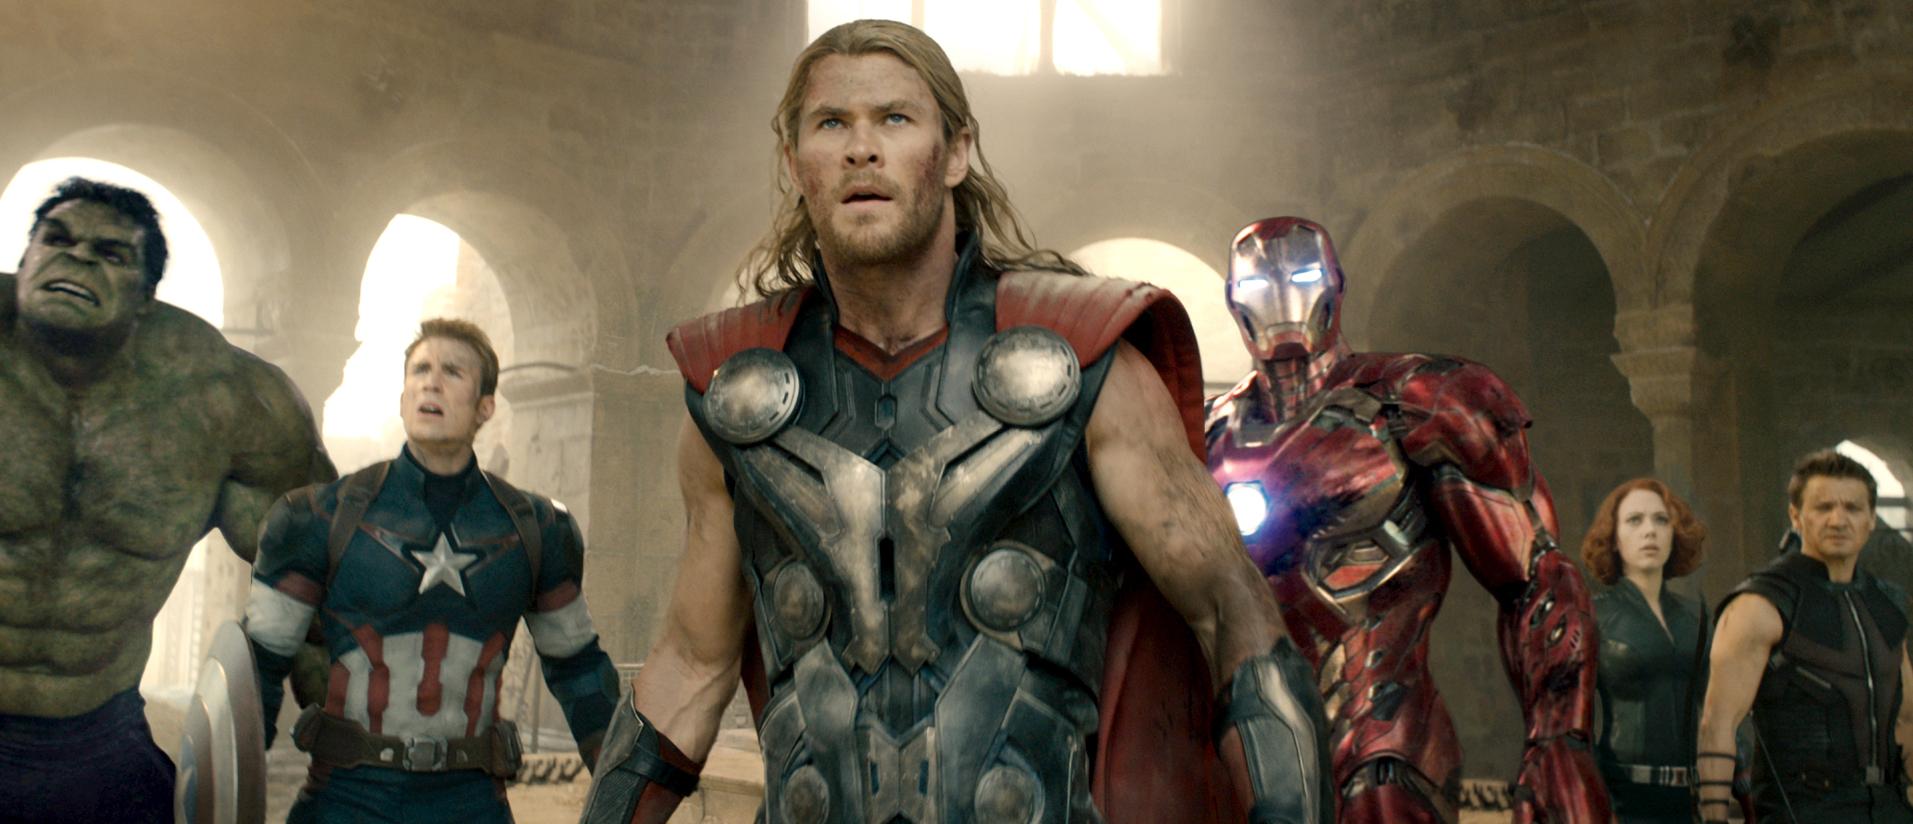 Мстители: Эра Альтрона (The Avengers: Age of Ultron) 2015